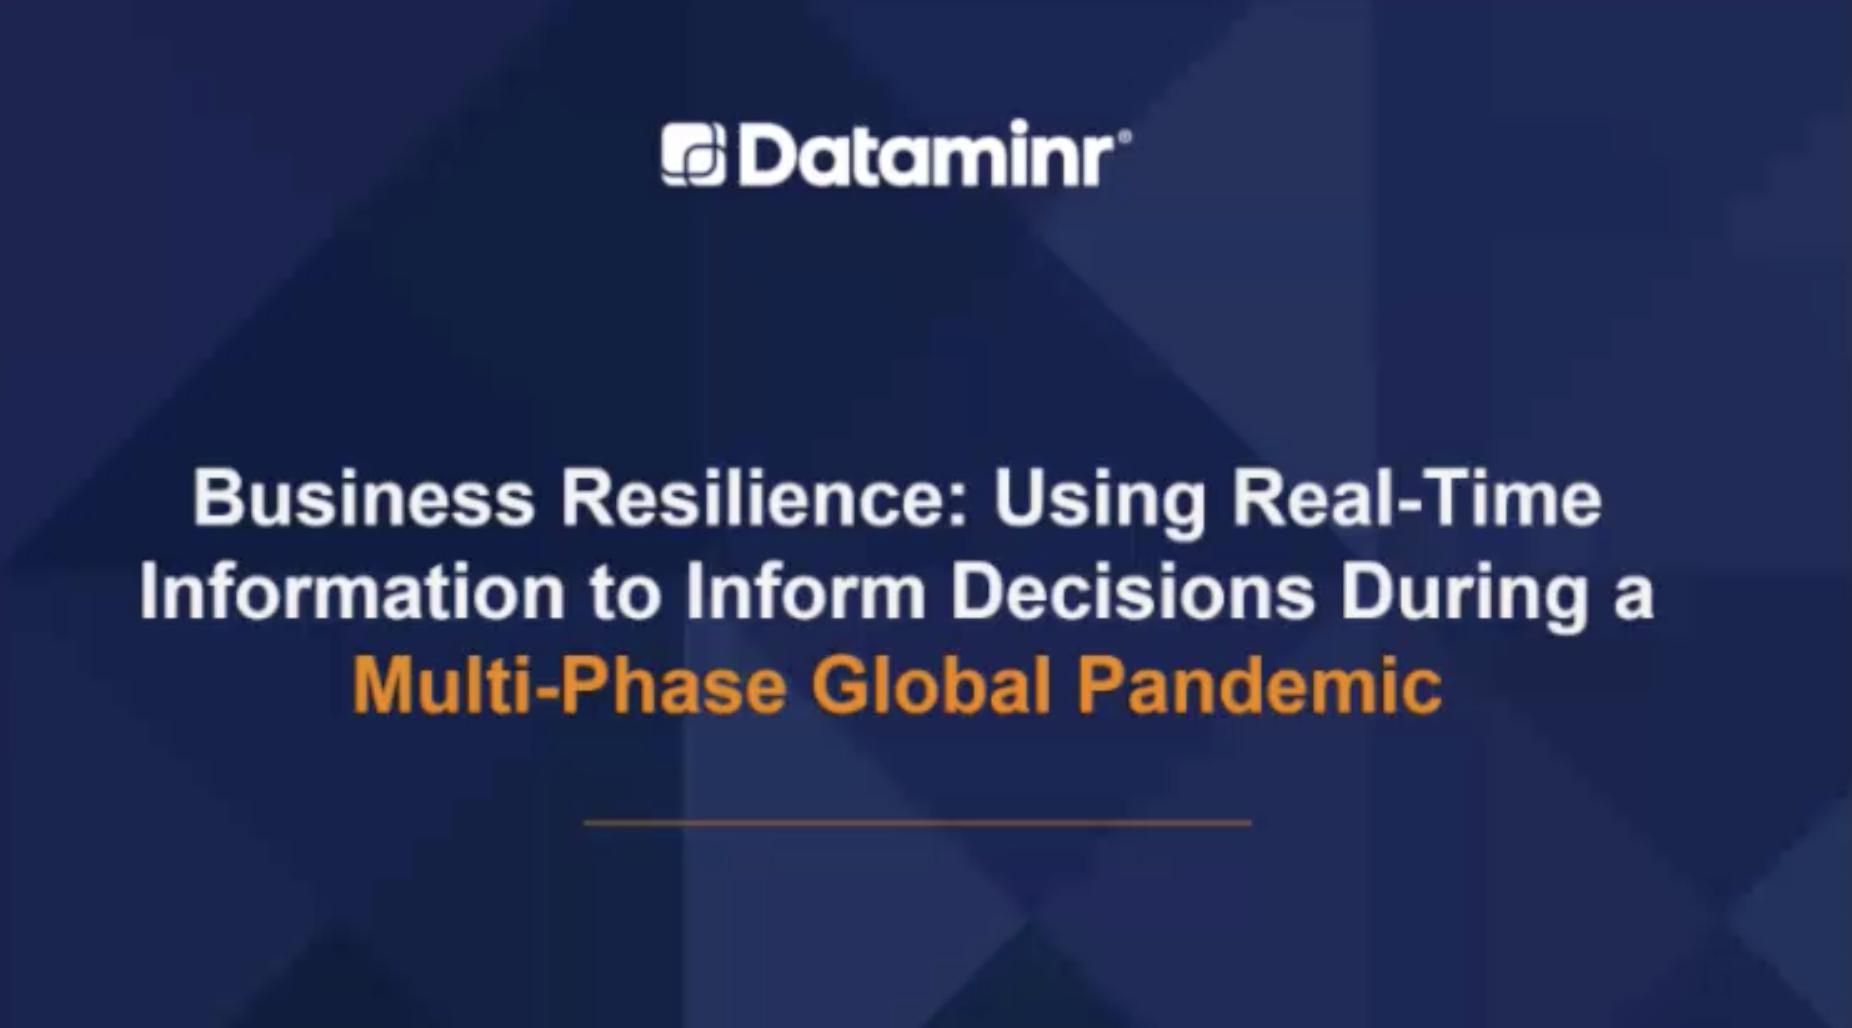 Thumbnail - business resilience covid19 webinar